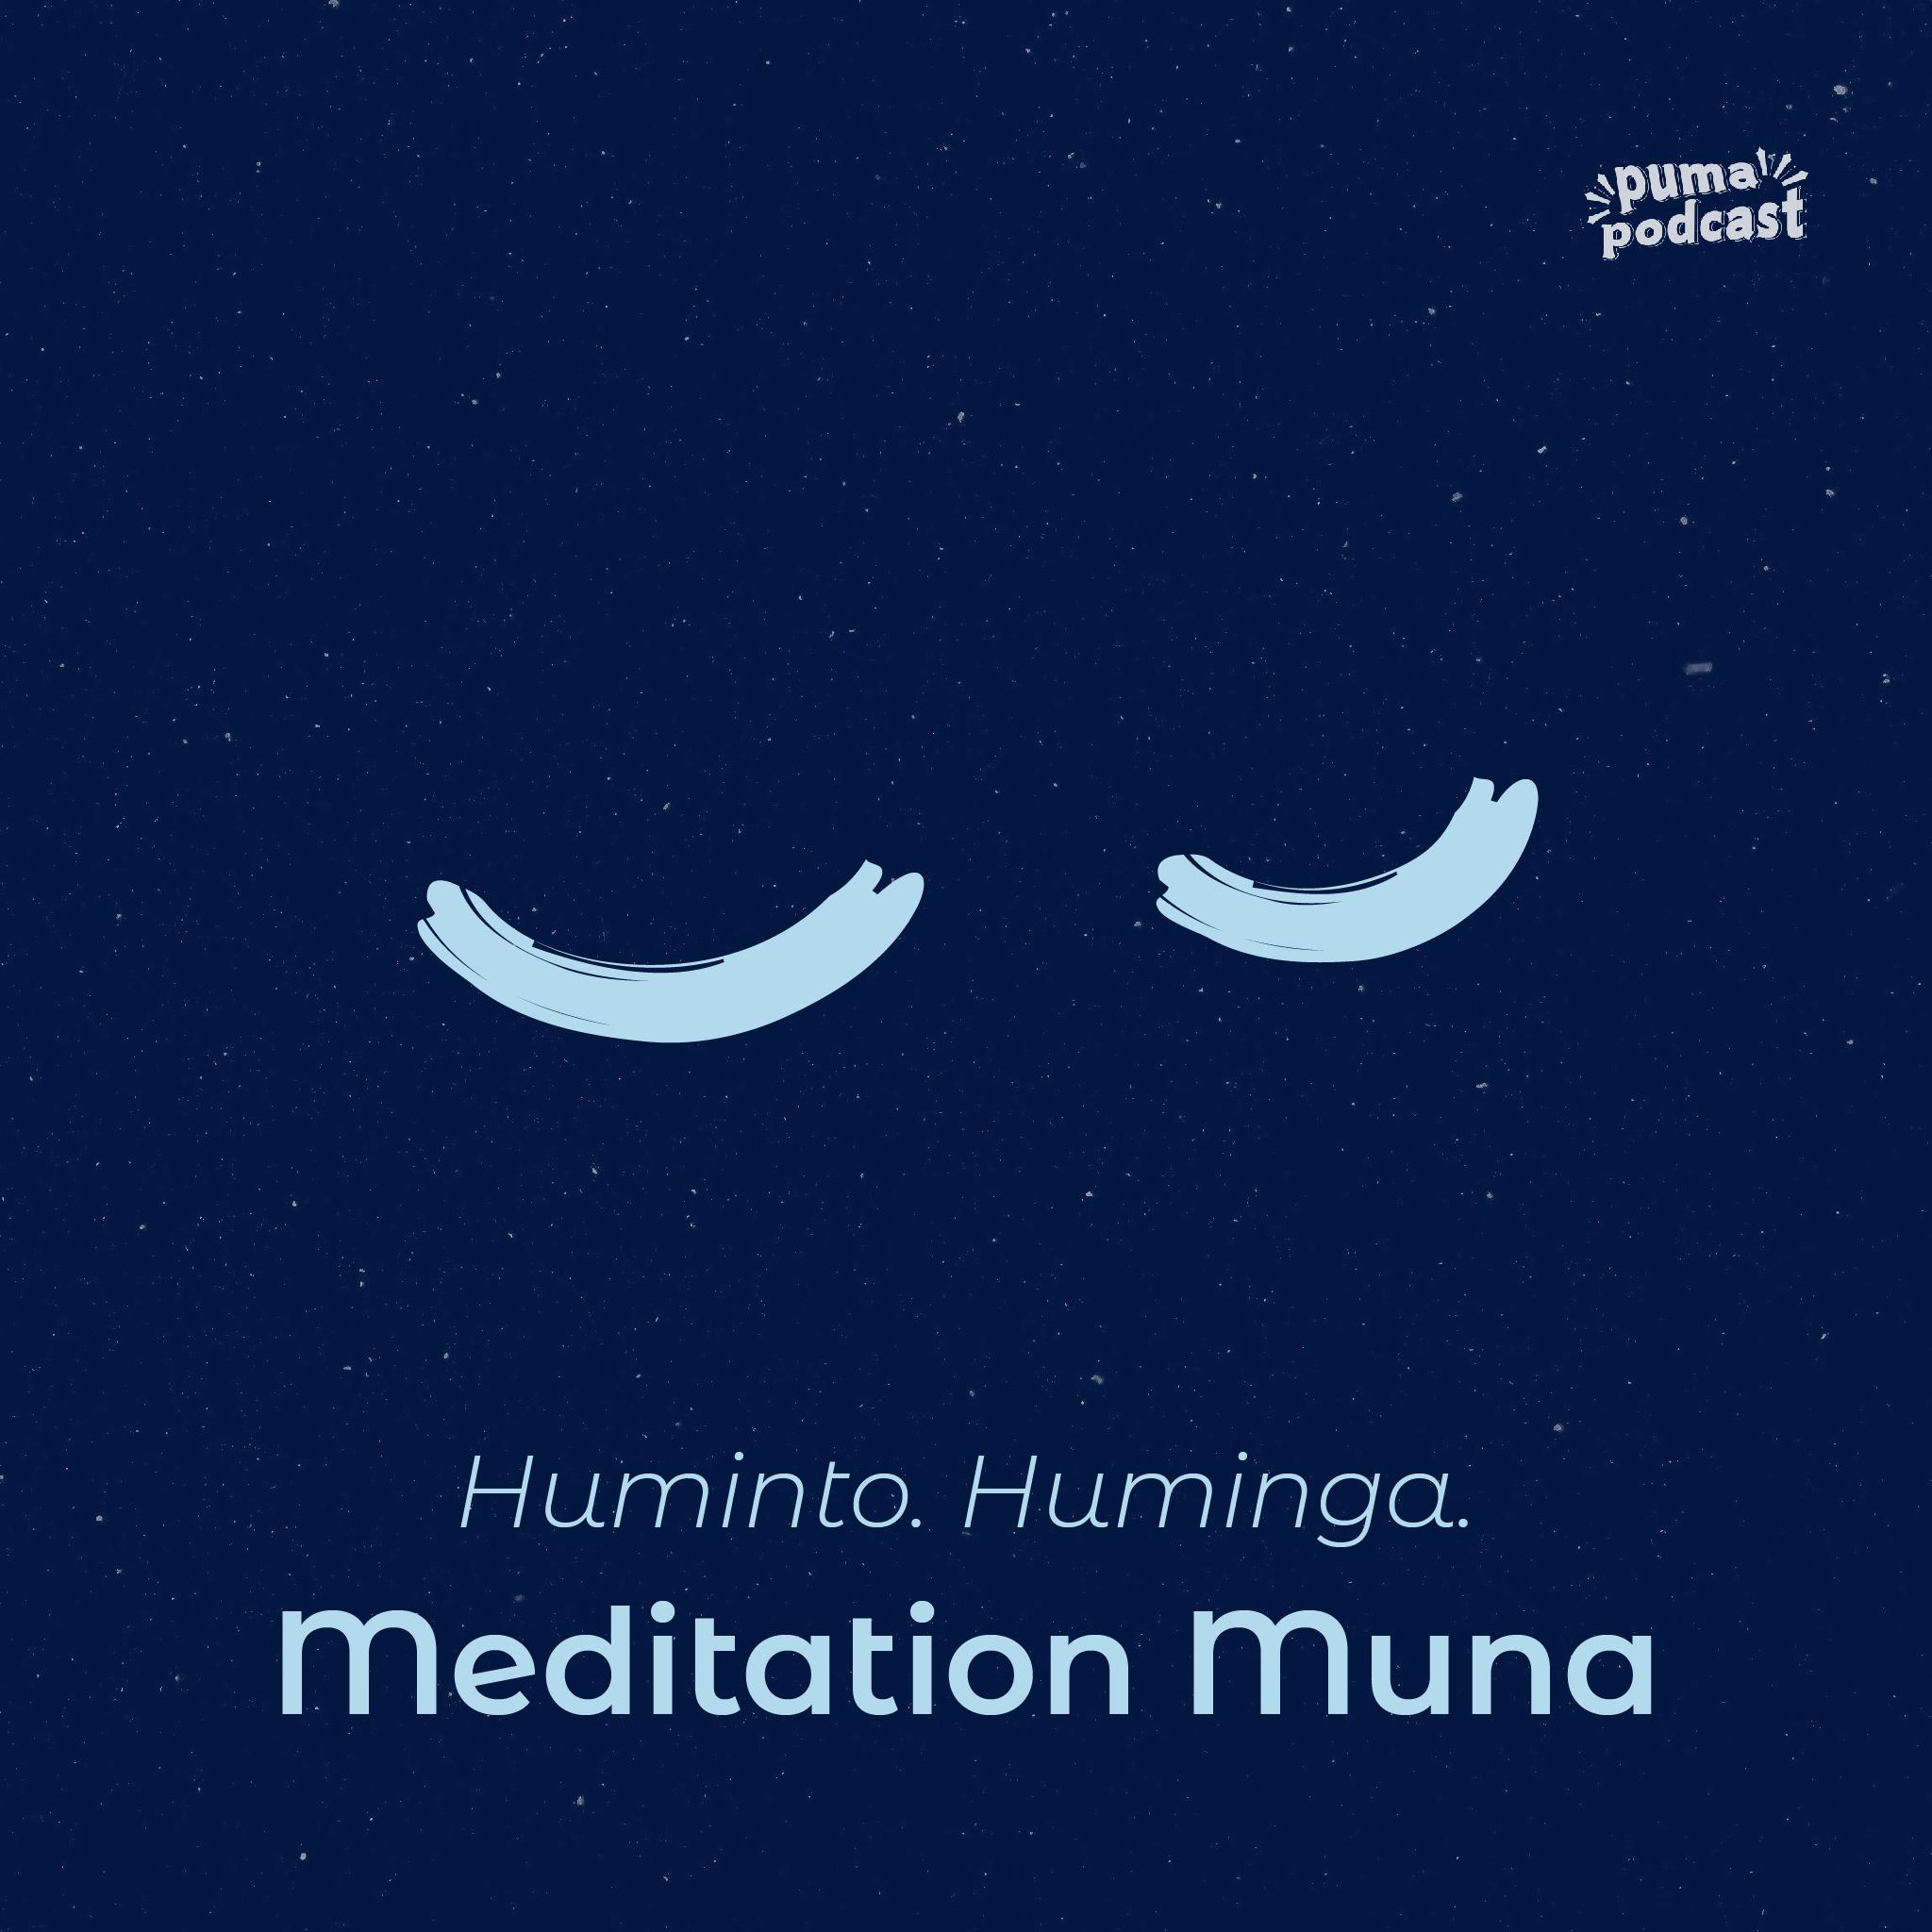 Meditation Muna